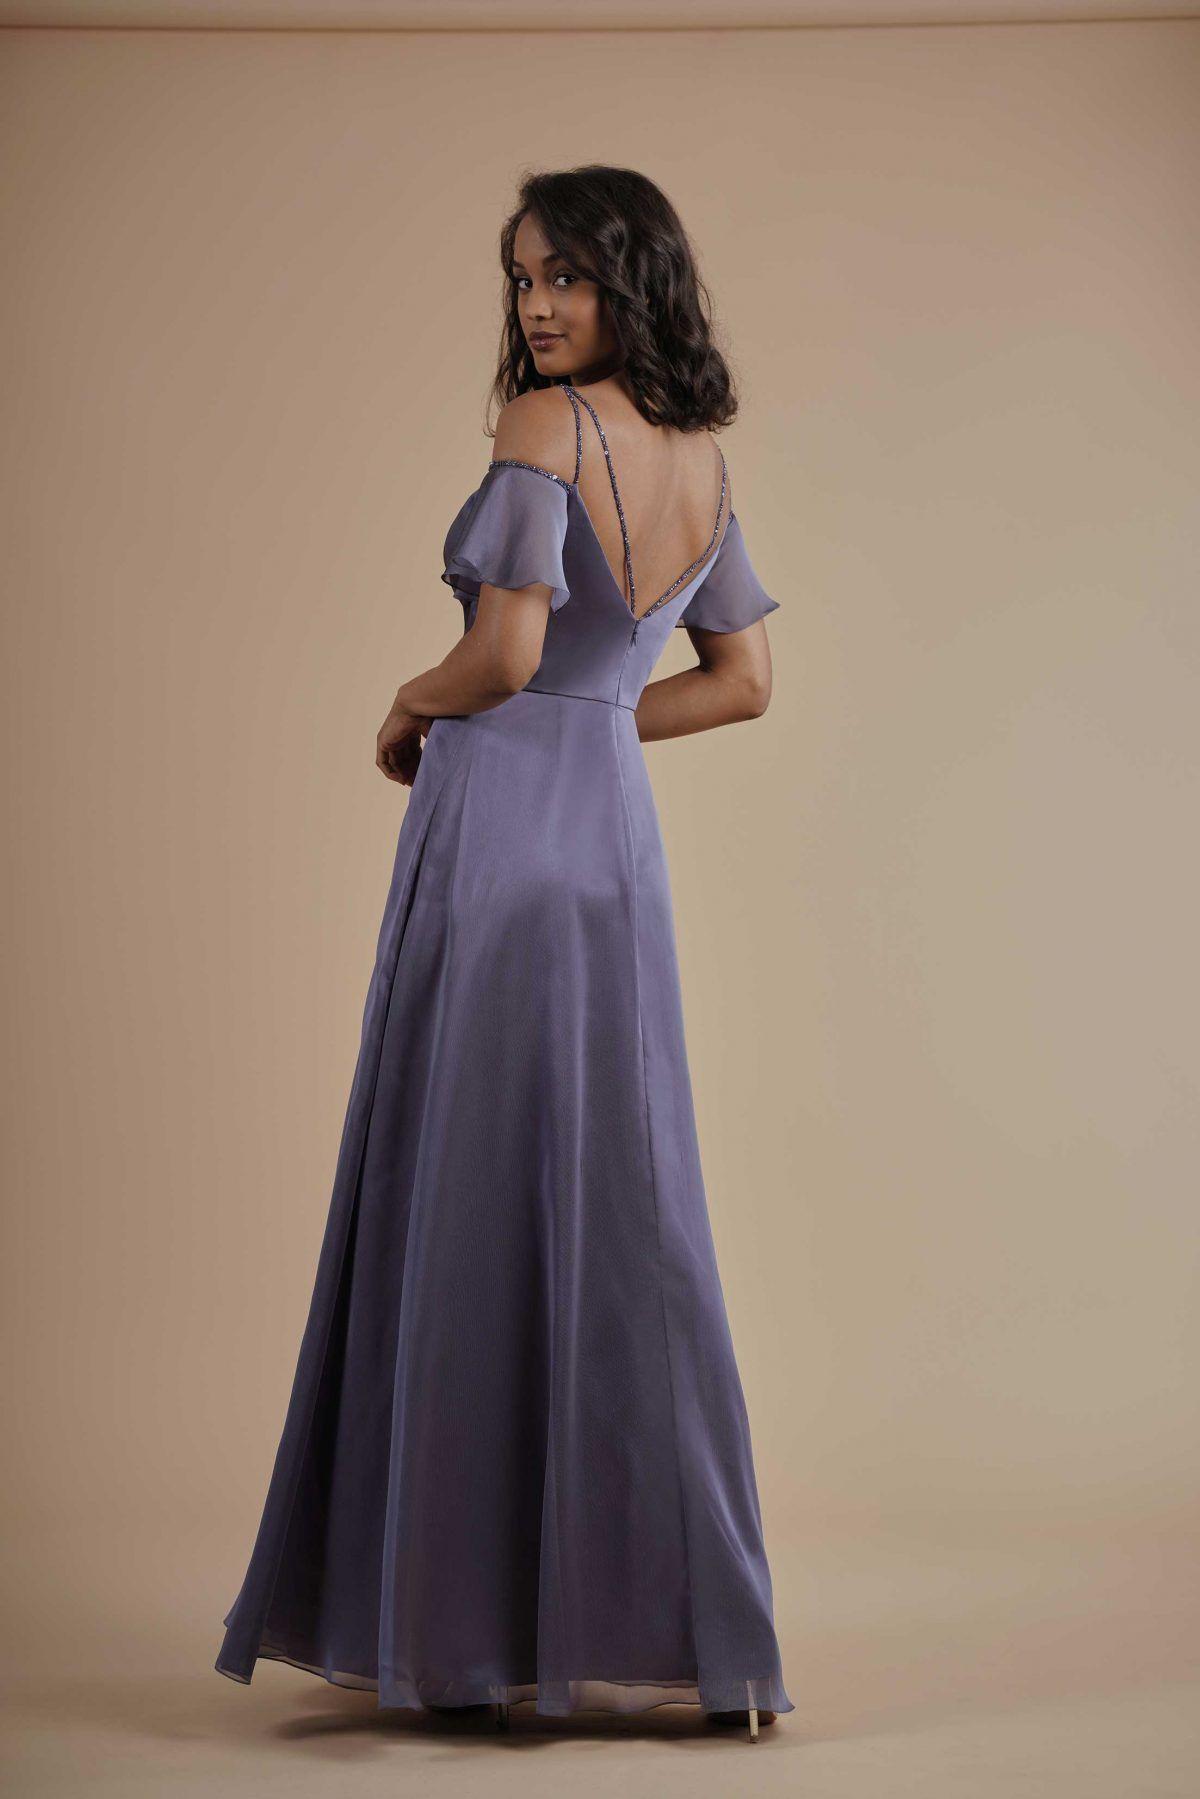 Abendmode Jasmine  Abendkleid L20  Abendkleid, Kleider